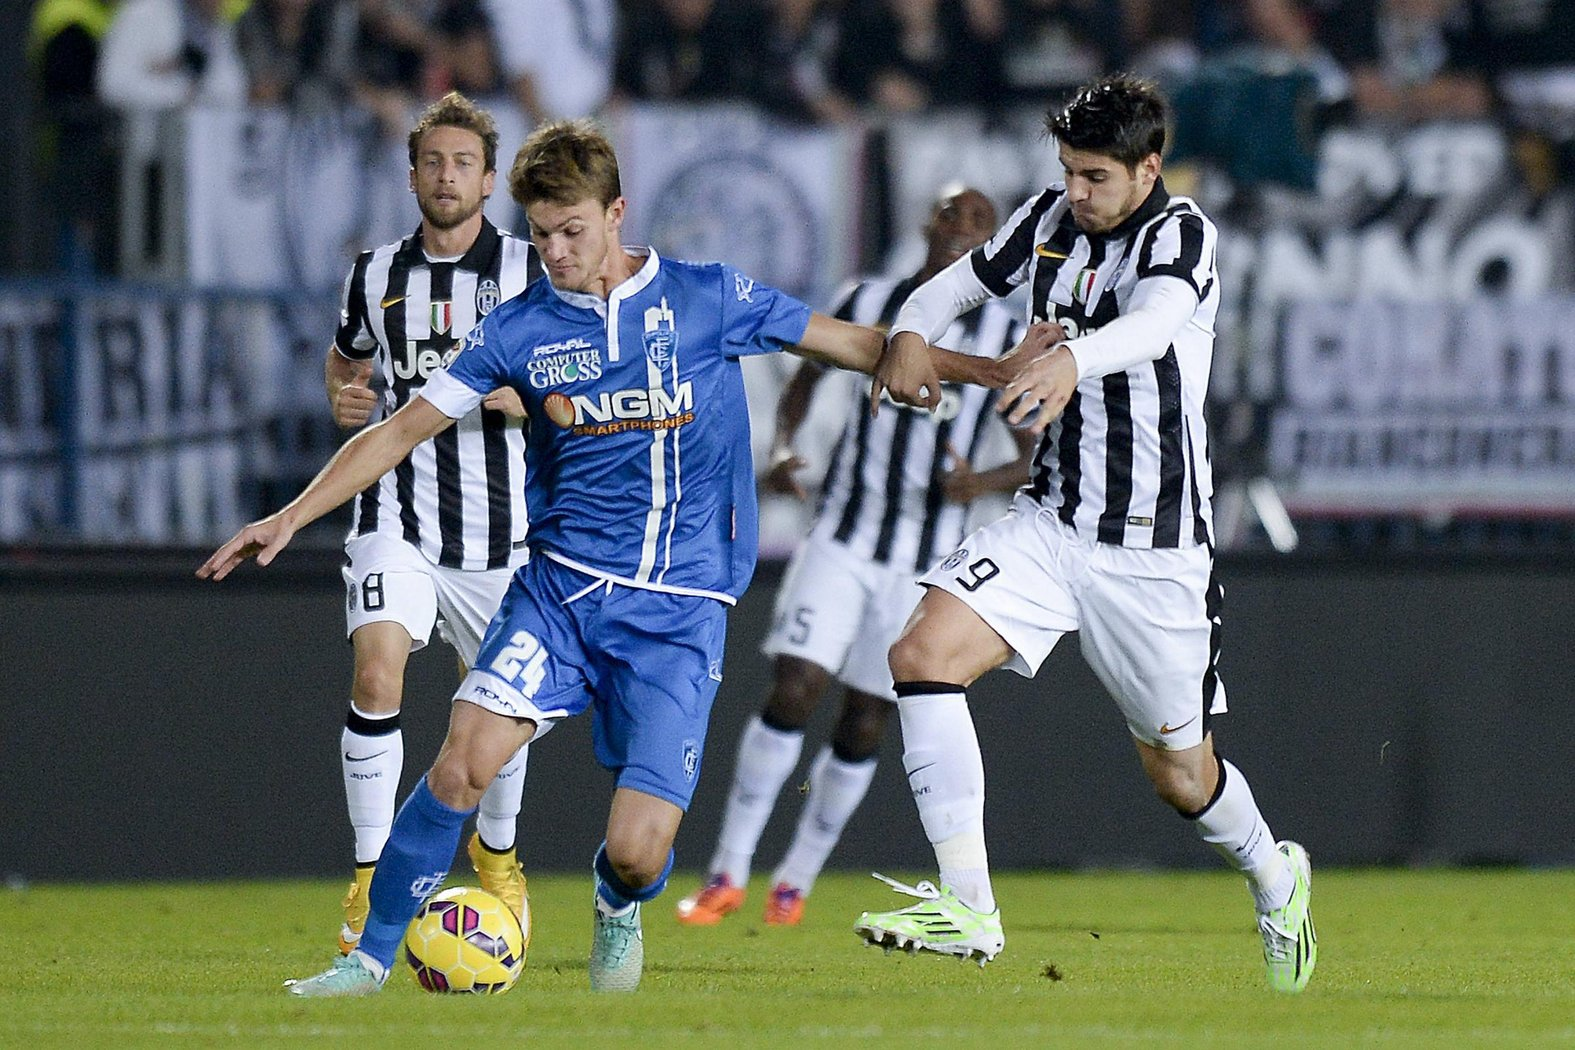 Juve_vs_Empoli2